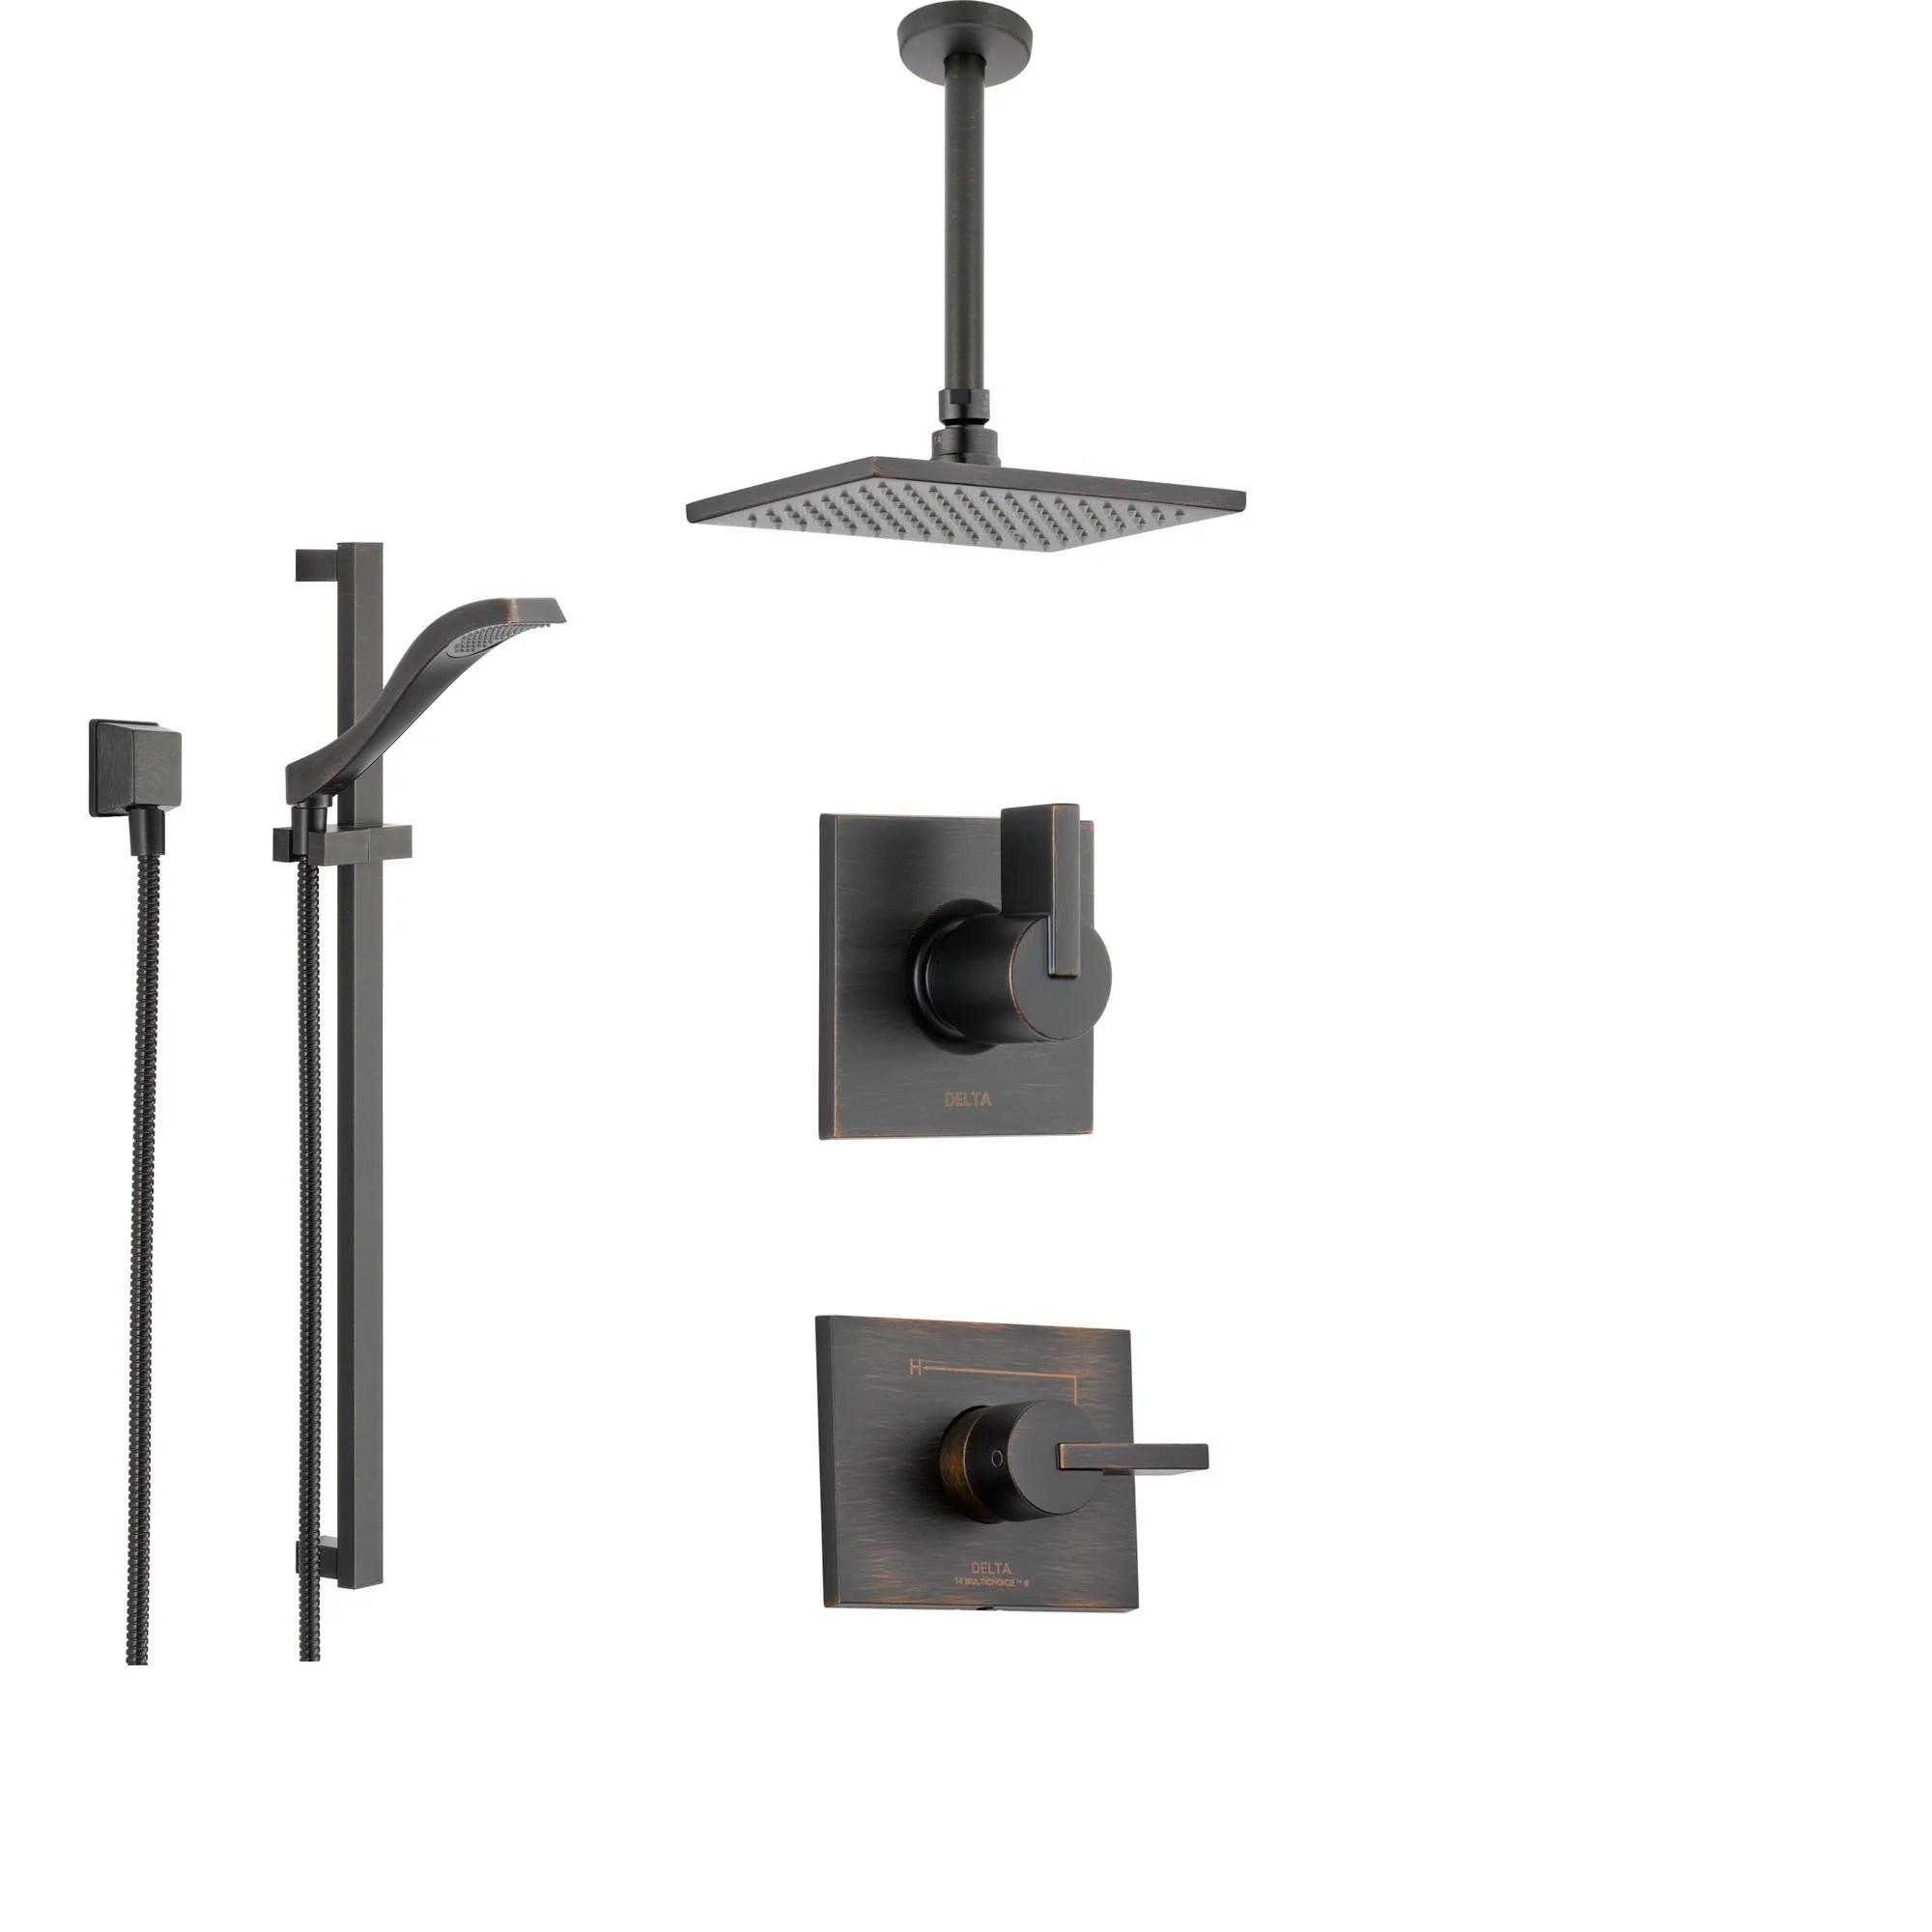 Delta Vero Venetian Bronze Shower System With Normal Shower Handle 3 Setting Diverter Large Modern Ceiling Mount Rain Showerhead And Handheld